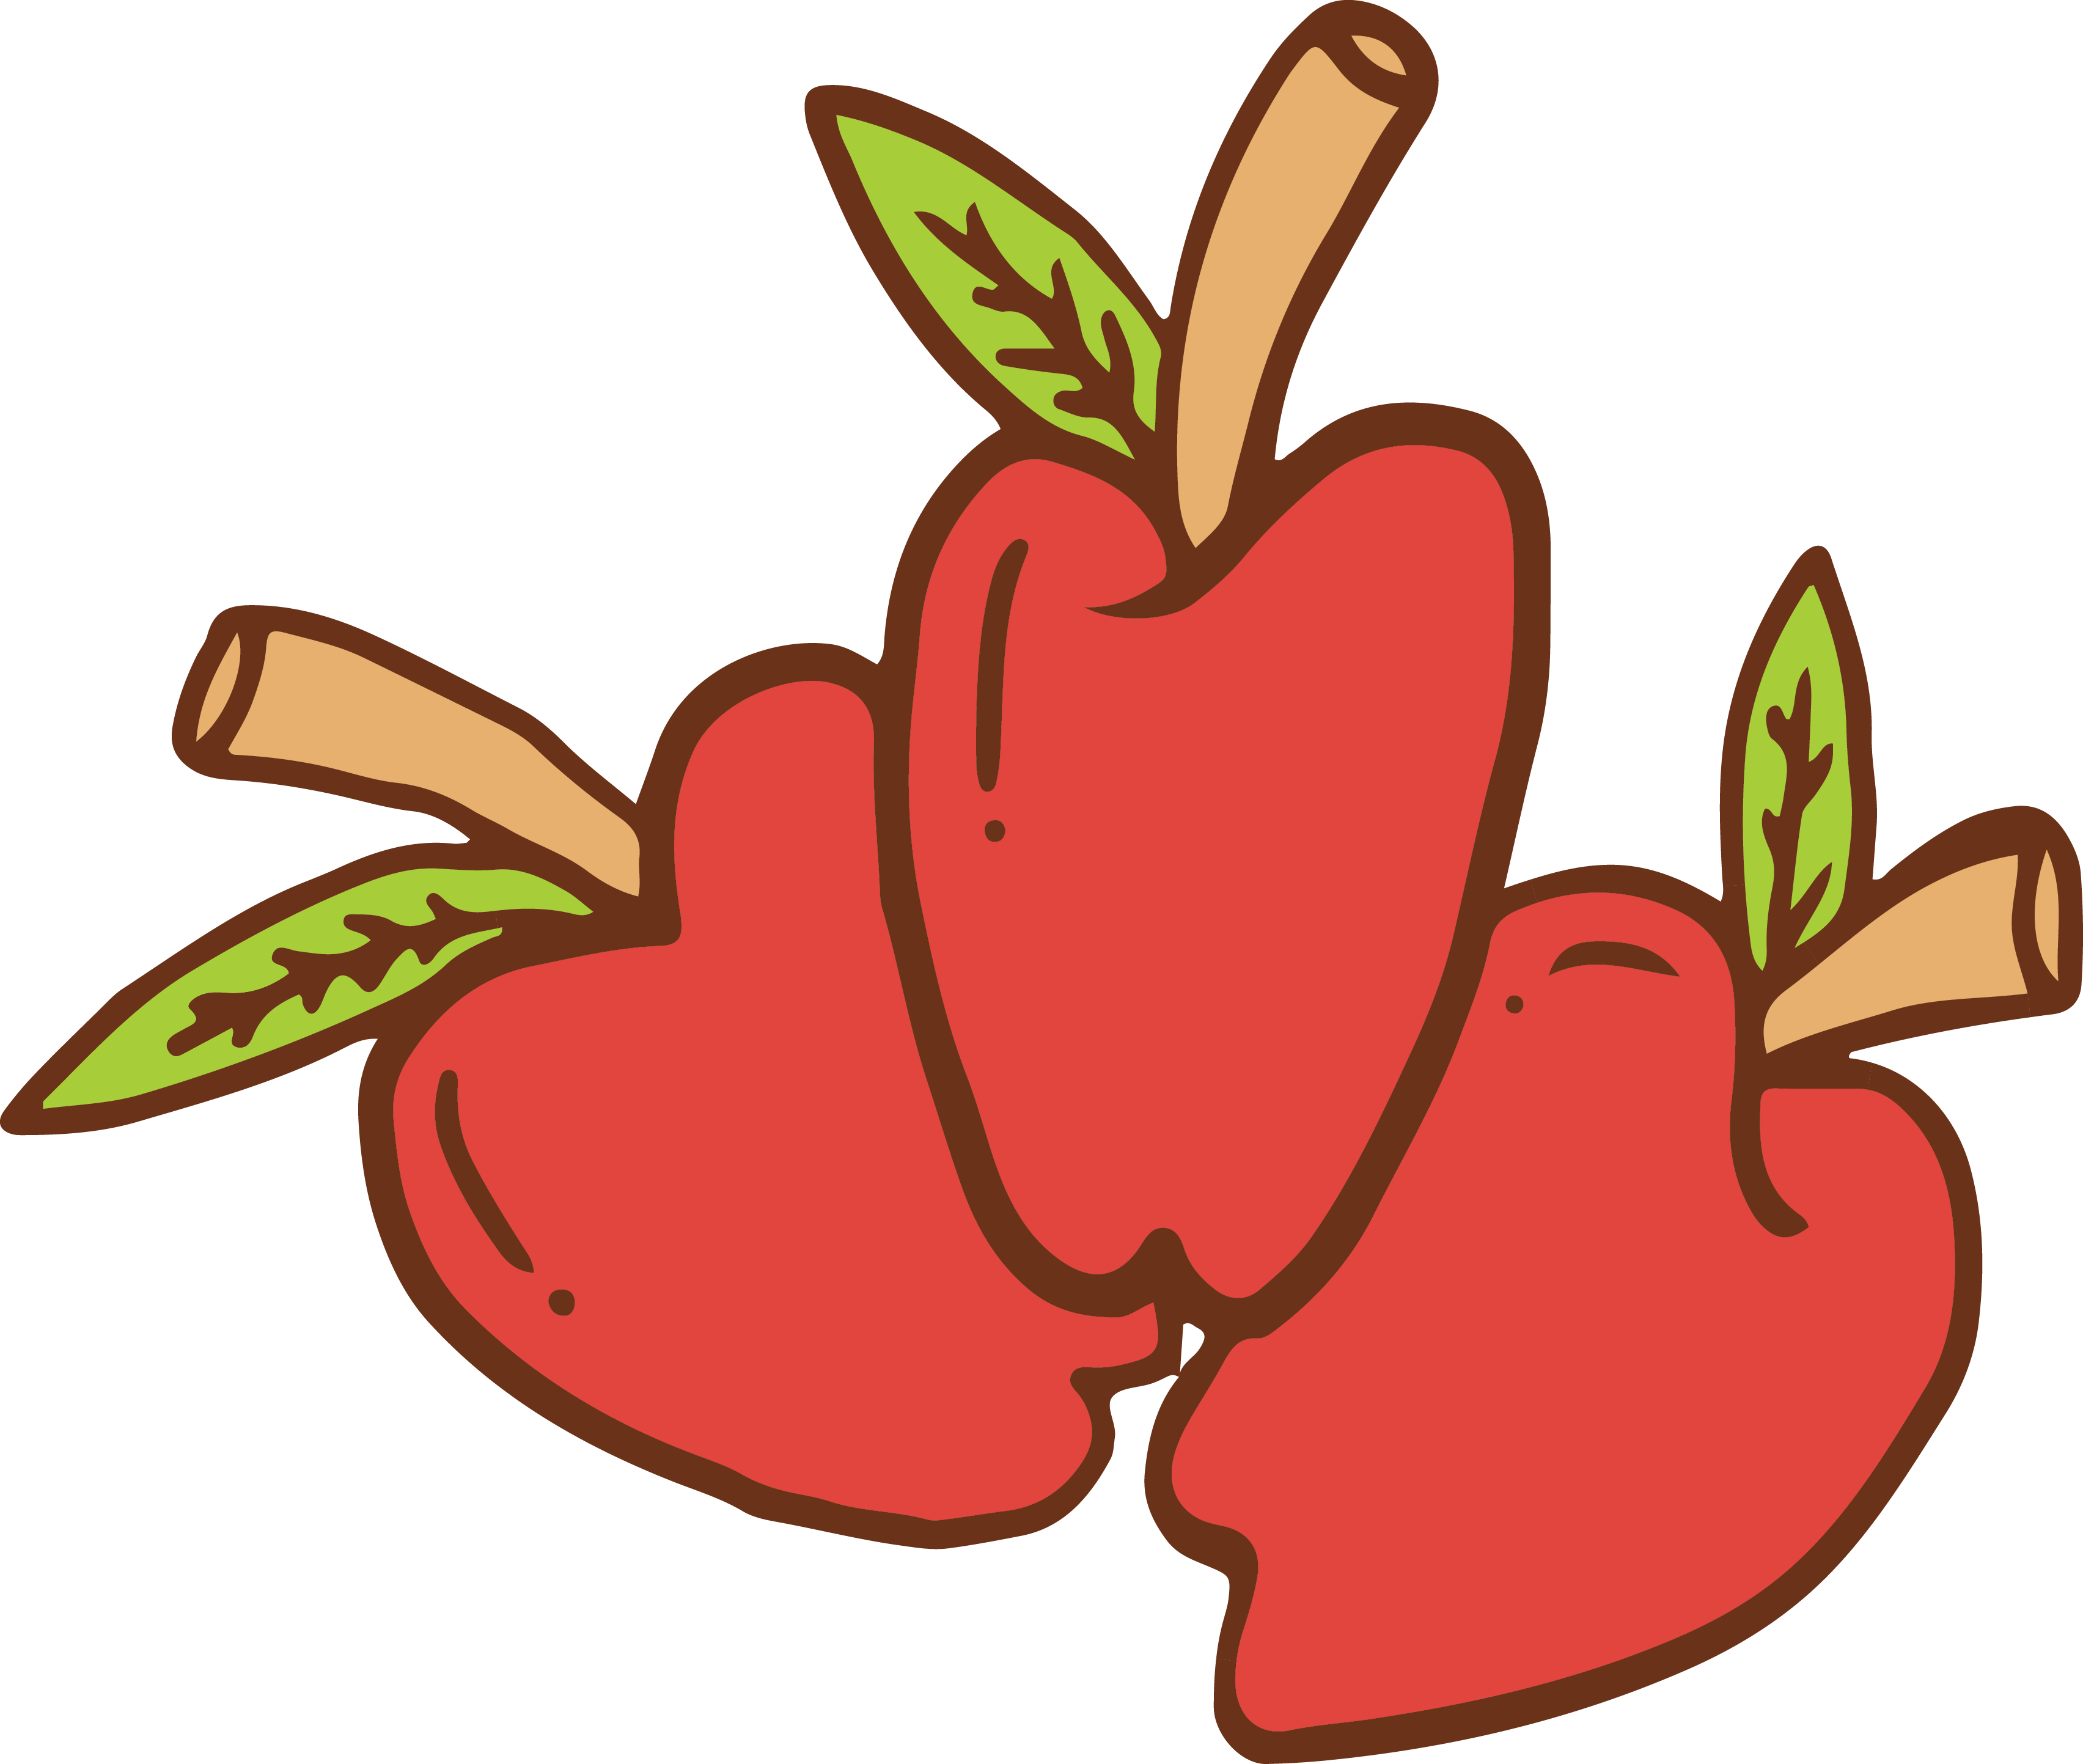 Red apple banana clipart jpg transparent library Apple Cartoon Drawing - Cartoon red apples 3408*2886 transprent Png ... jpg transparent library